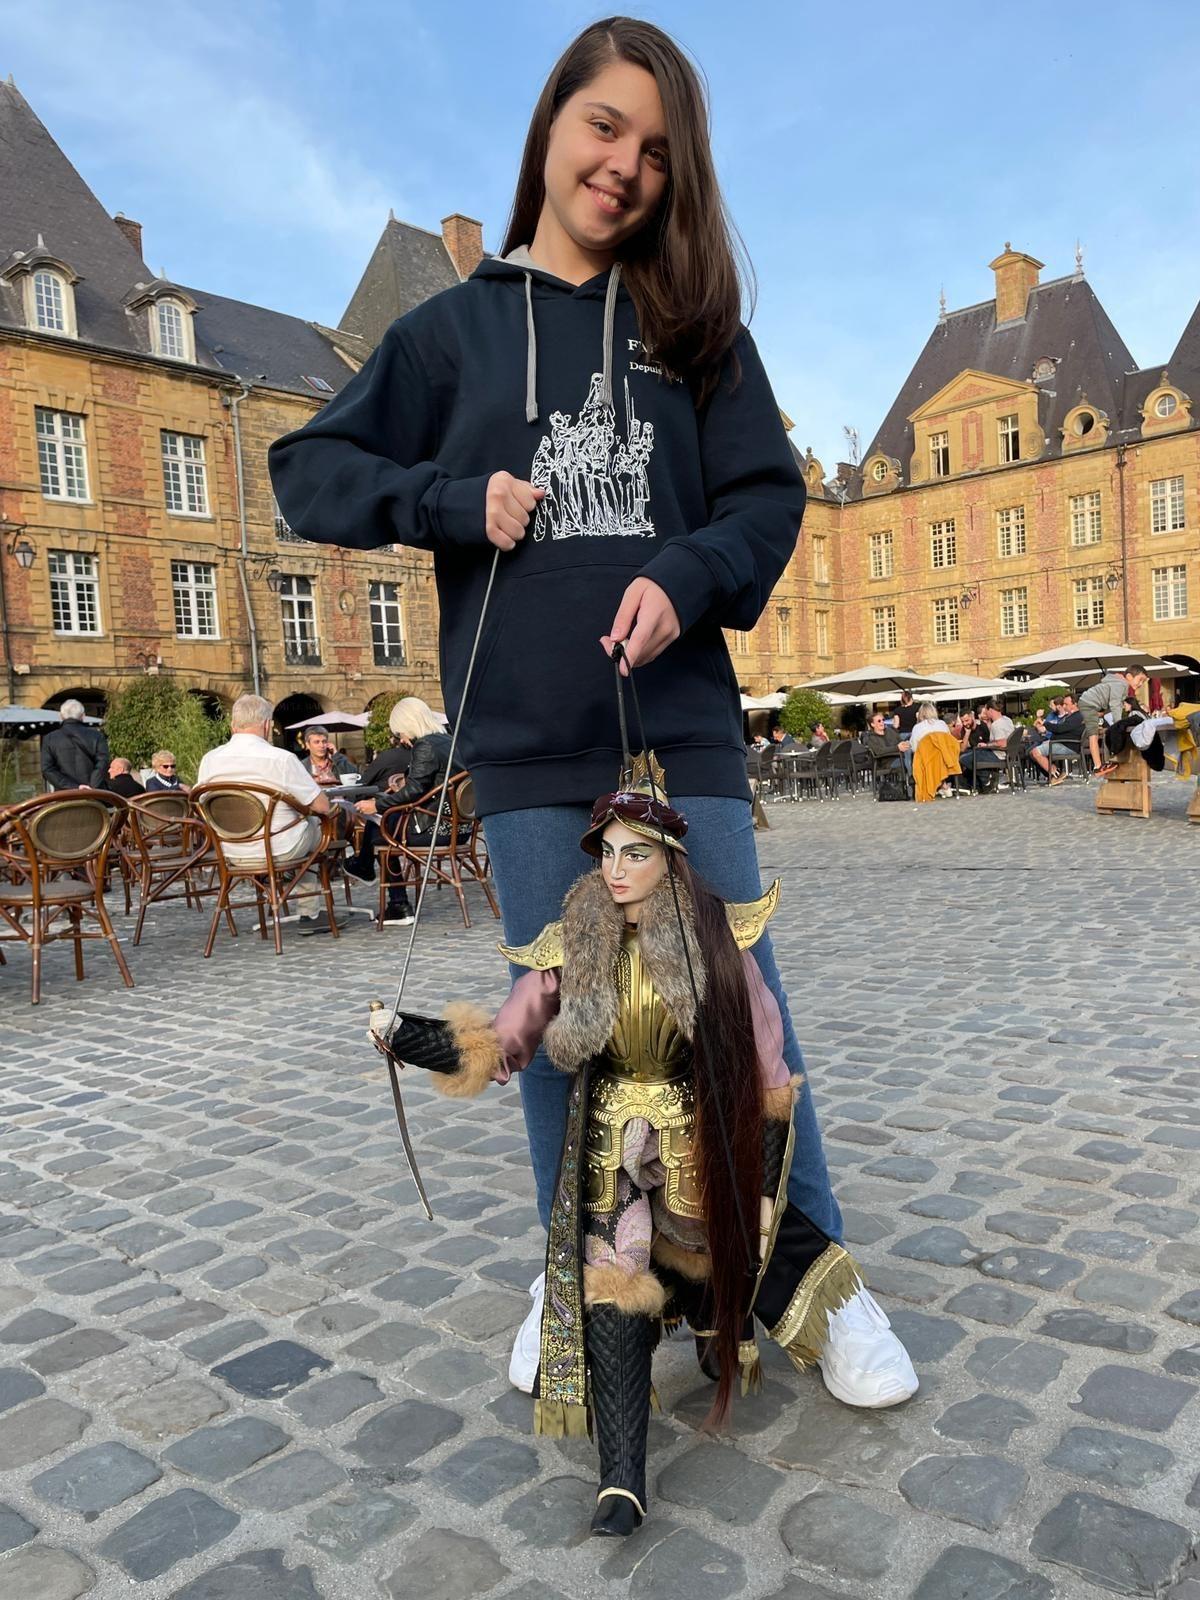 La giovanissima pupara siracusana Alessandra Mauceri incanta la Francia